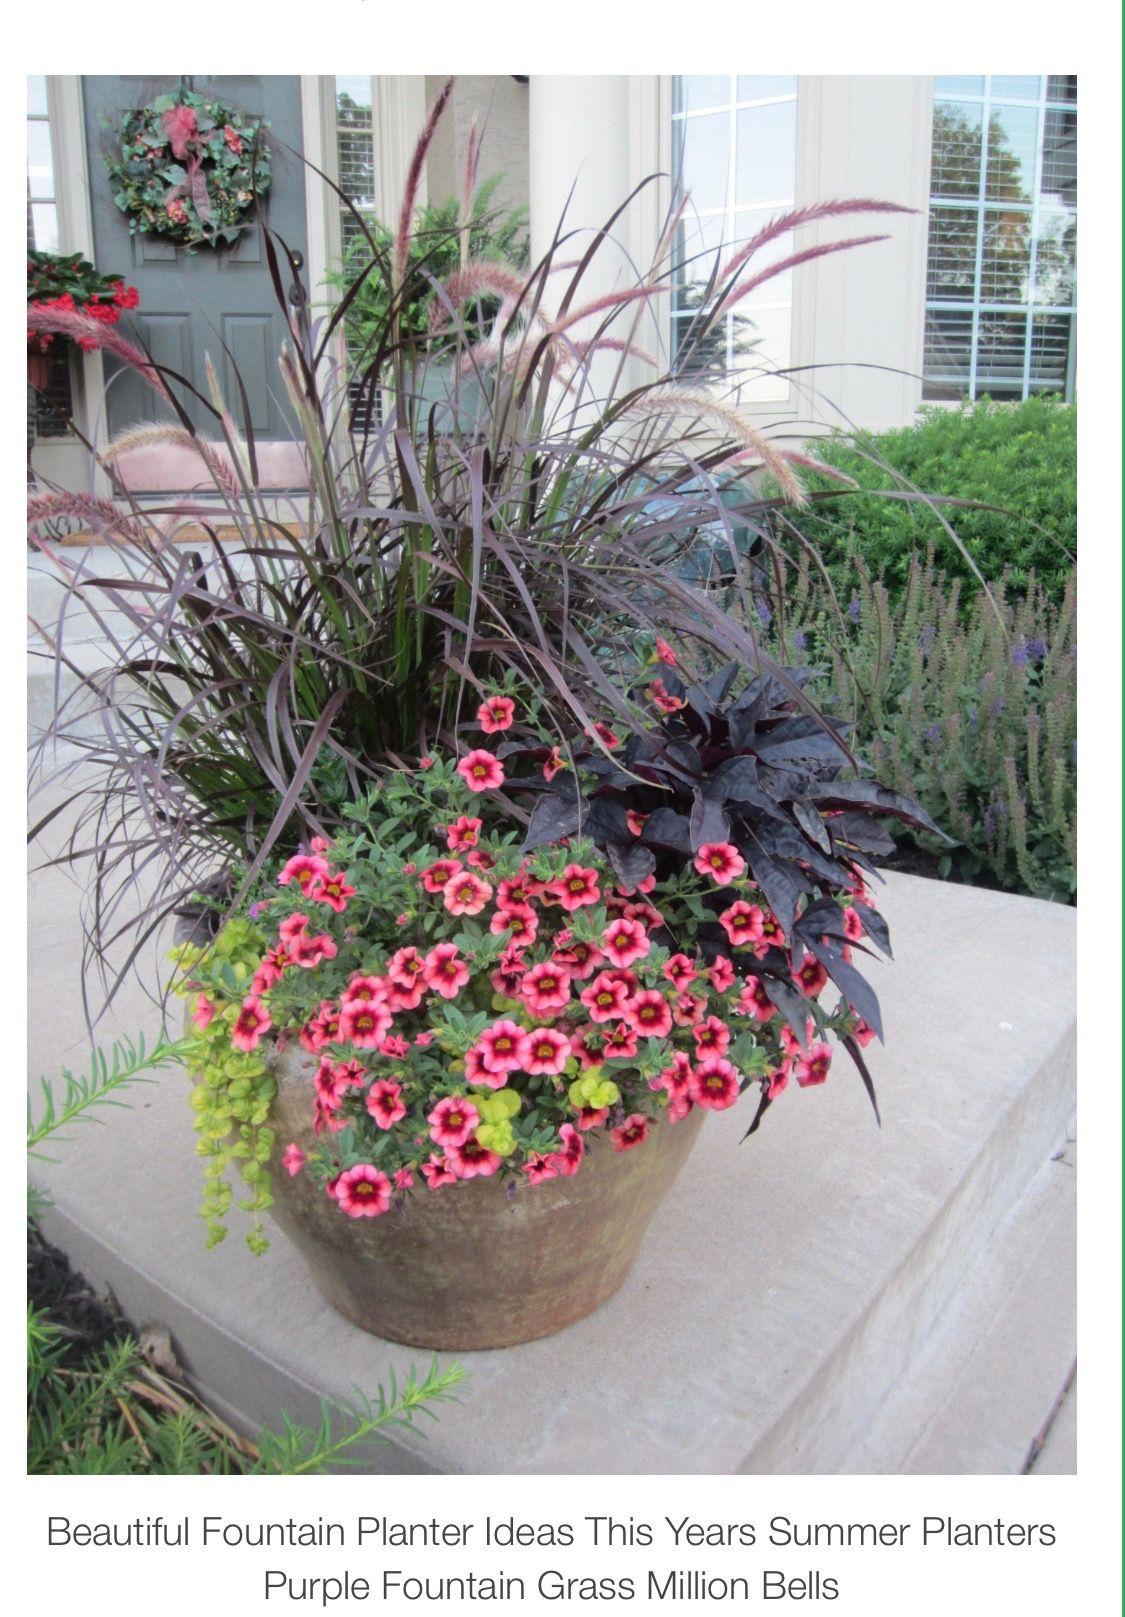 Pin By Anna Sztuk On Flowers Plants Summer Planter Patio Flowers Fountain Grass